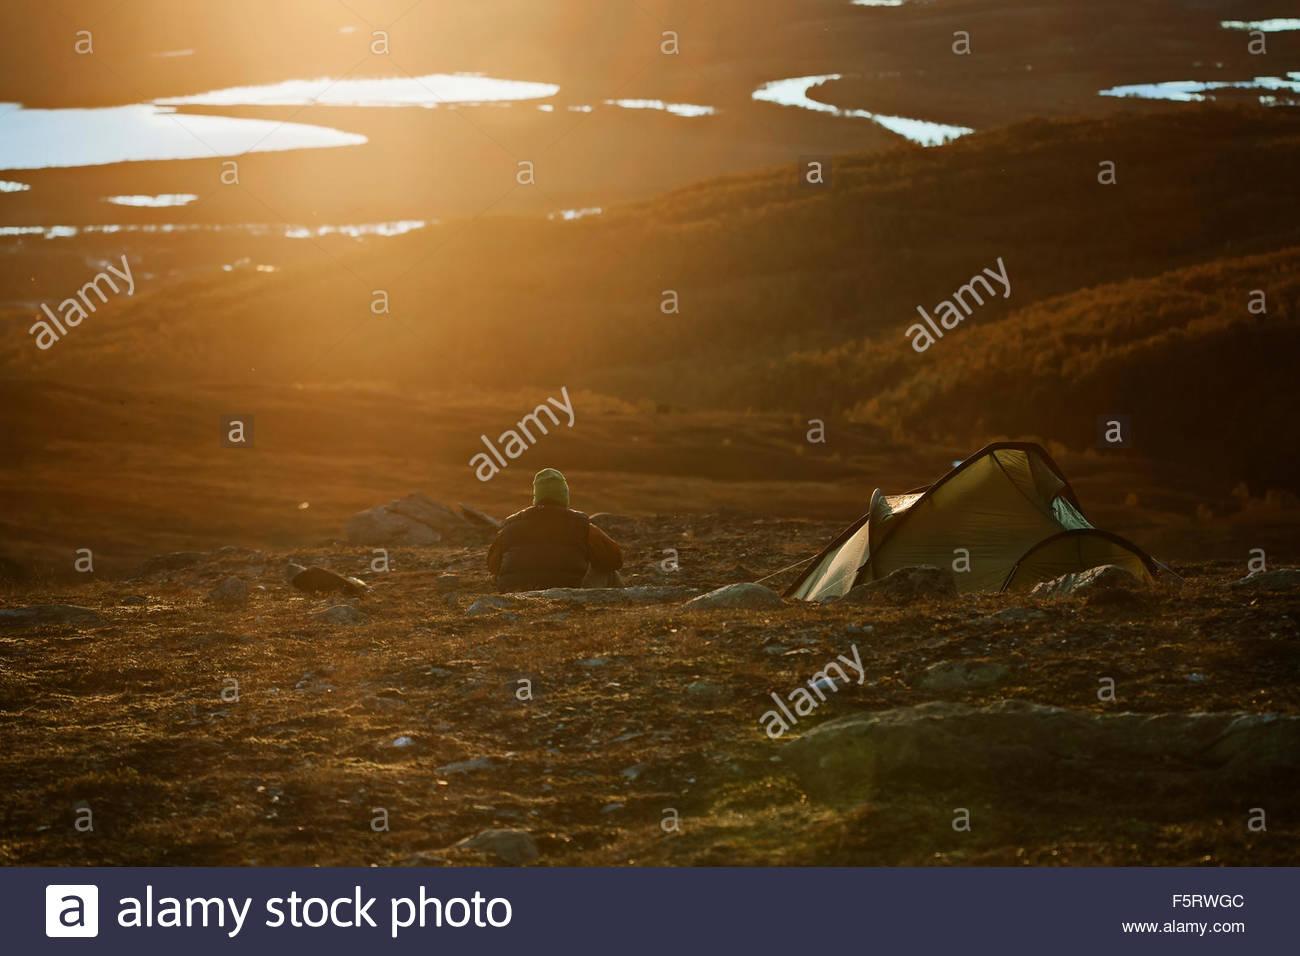 La Svezia Vasterbotten, Hemavan, uomo campeggio al tramonto Immagini Stock